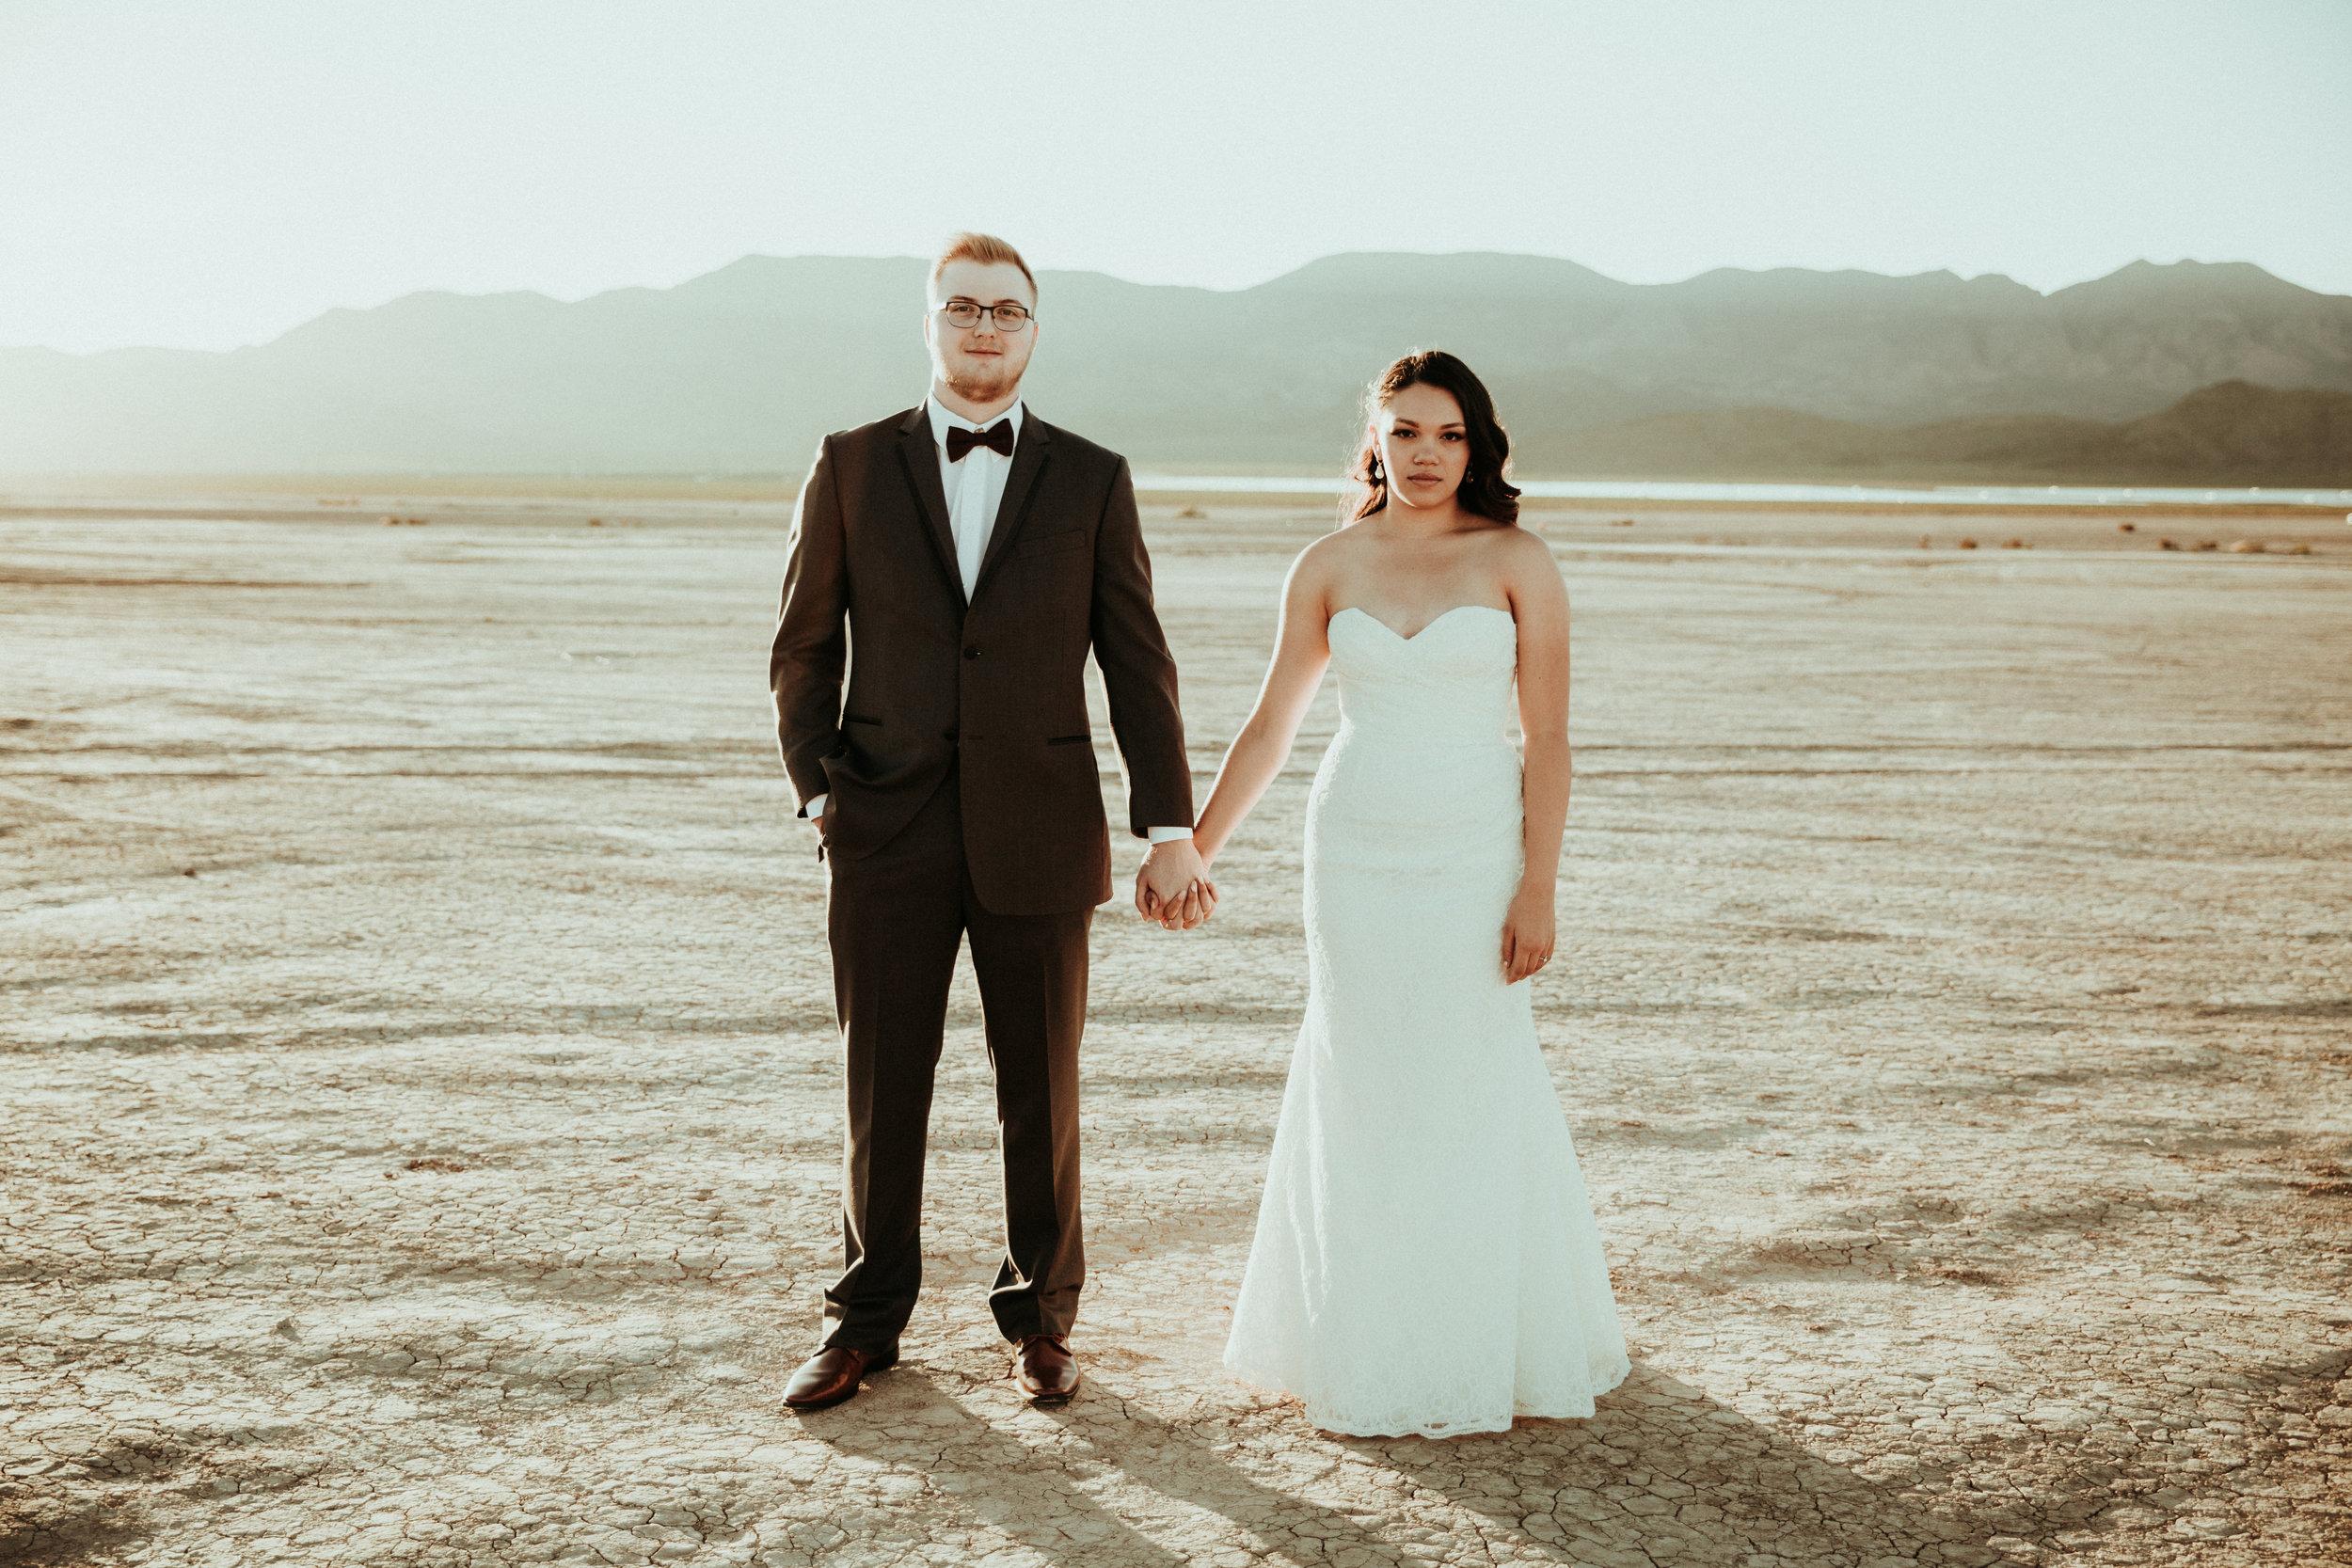 Las Vegas Wedding Photographer - Henderson, NV - Seattle Wedding Photography - Portland Wedding Photographer - PNW Elopement Photographer - First Look